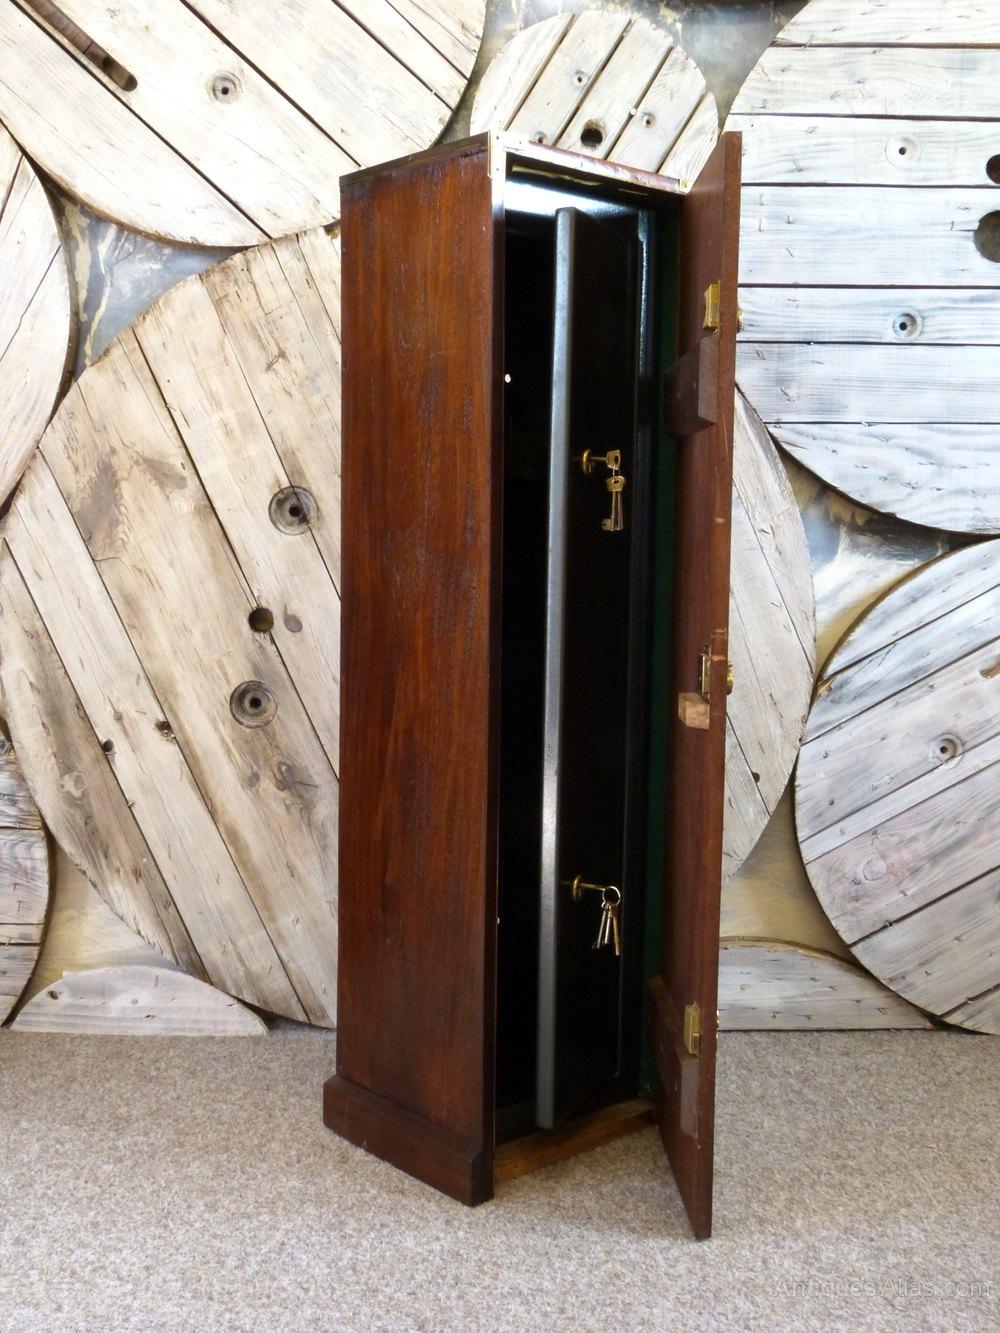 Vintage Gun Cabinet Vintage and Retro Cabinets and Vitrines ... - Antiques Atlas - Vintage Gun Cabinet